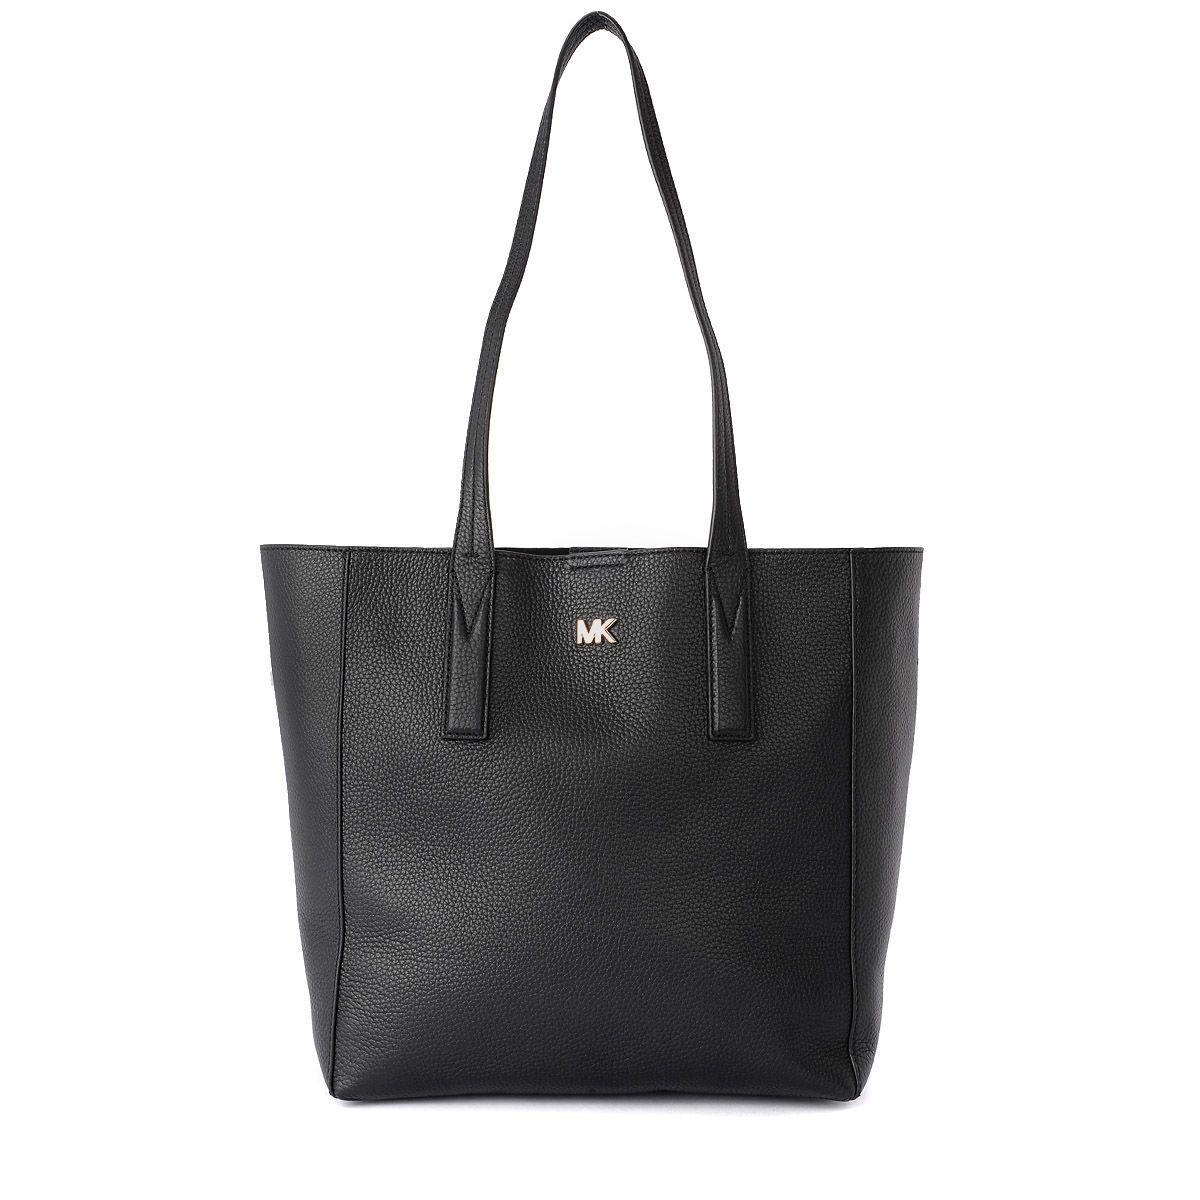 Michael Kors Junie Medium Black Leather Shoulder Bag In Nero